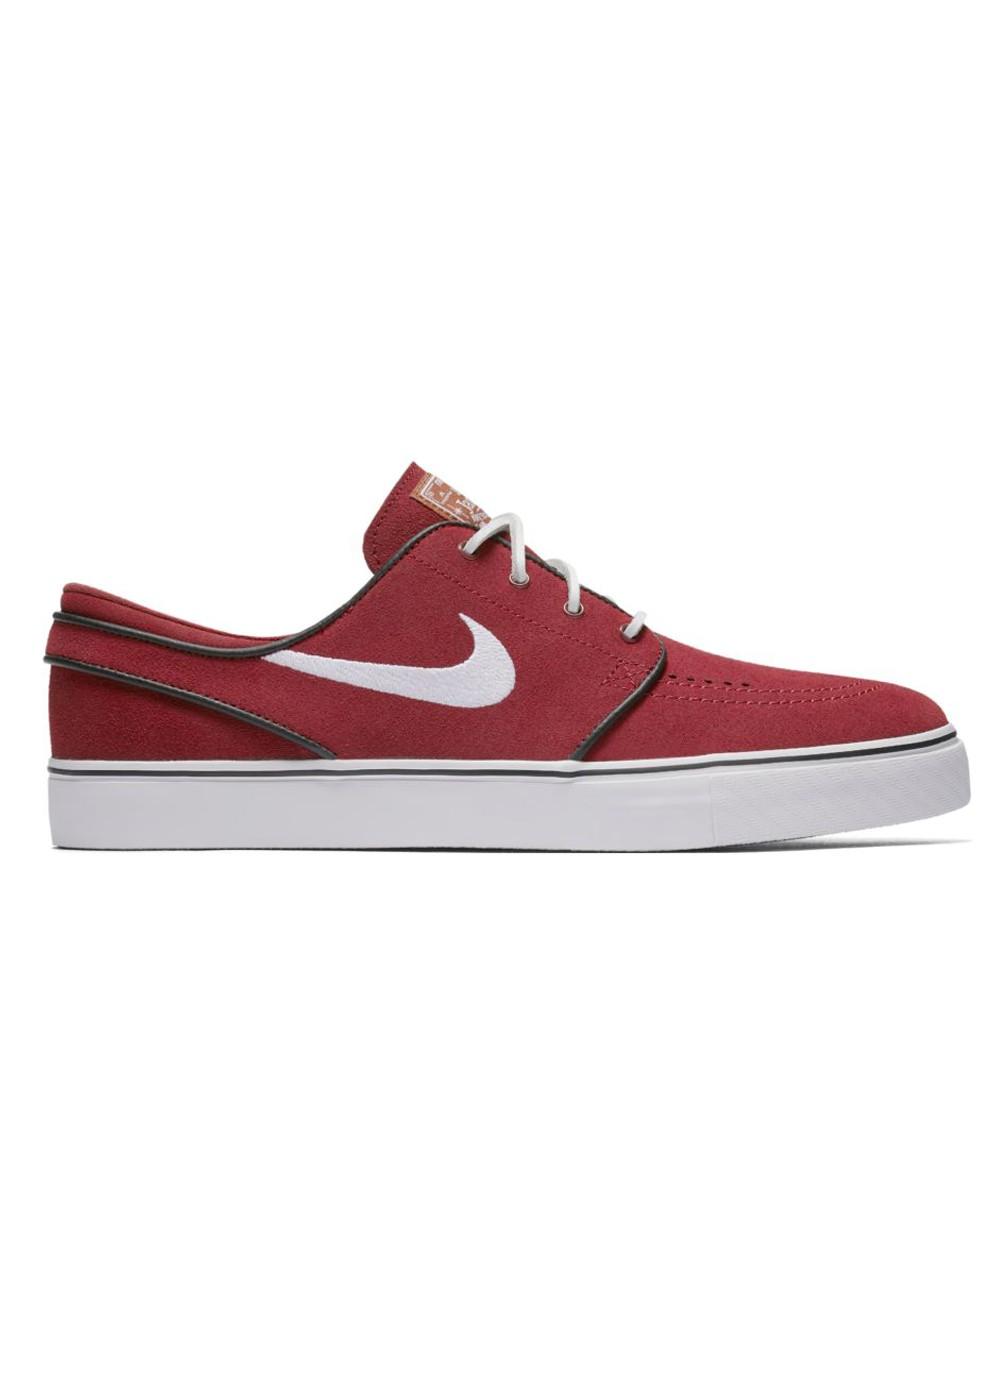 hot sale online 52e7c e3087 Nike SB Shoes Stefan Janoski OG ...